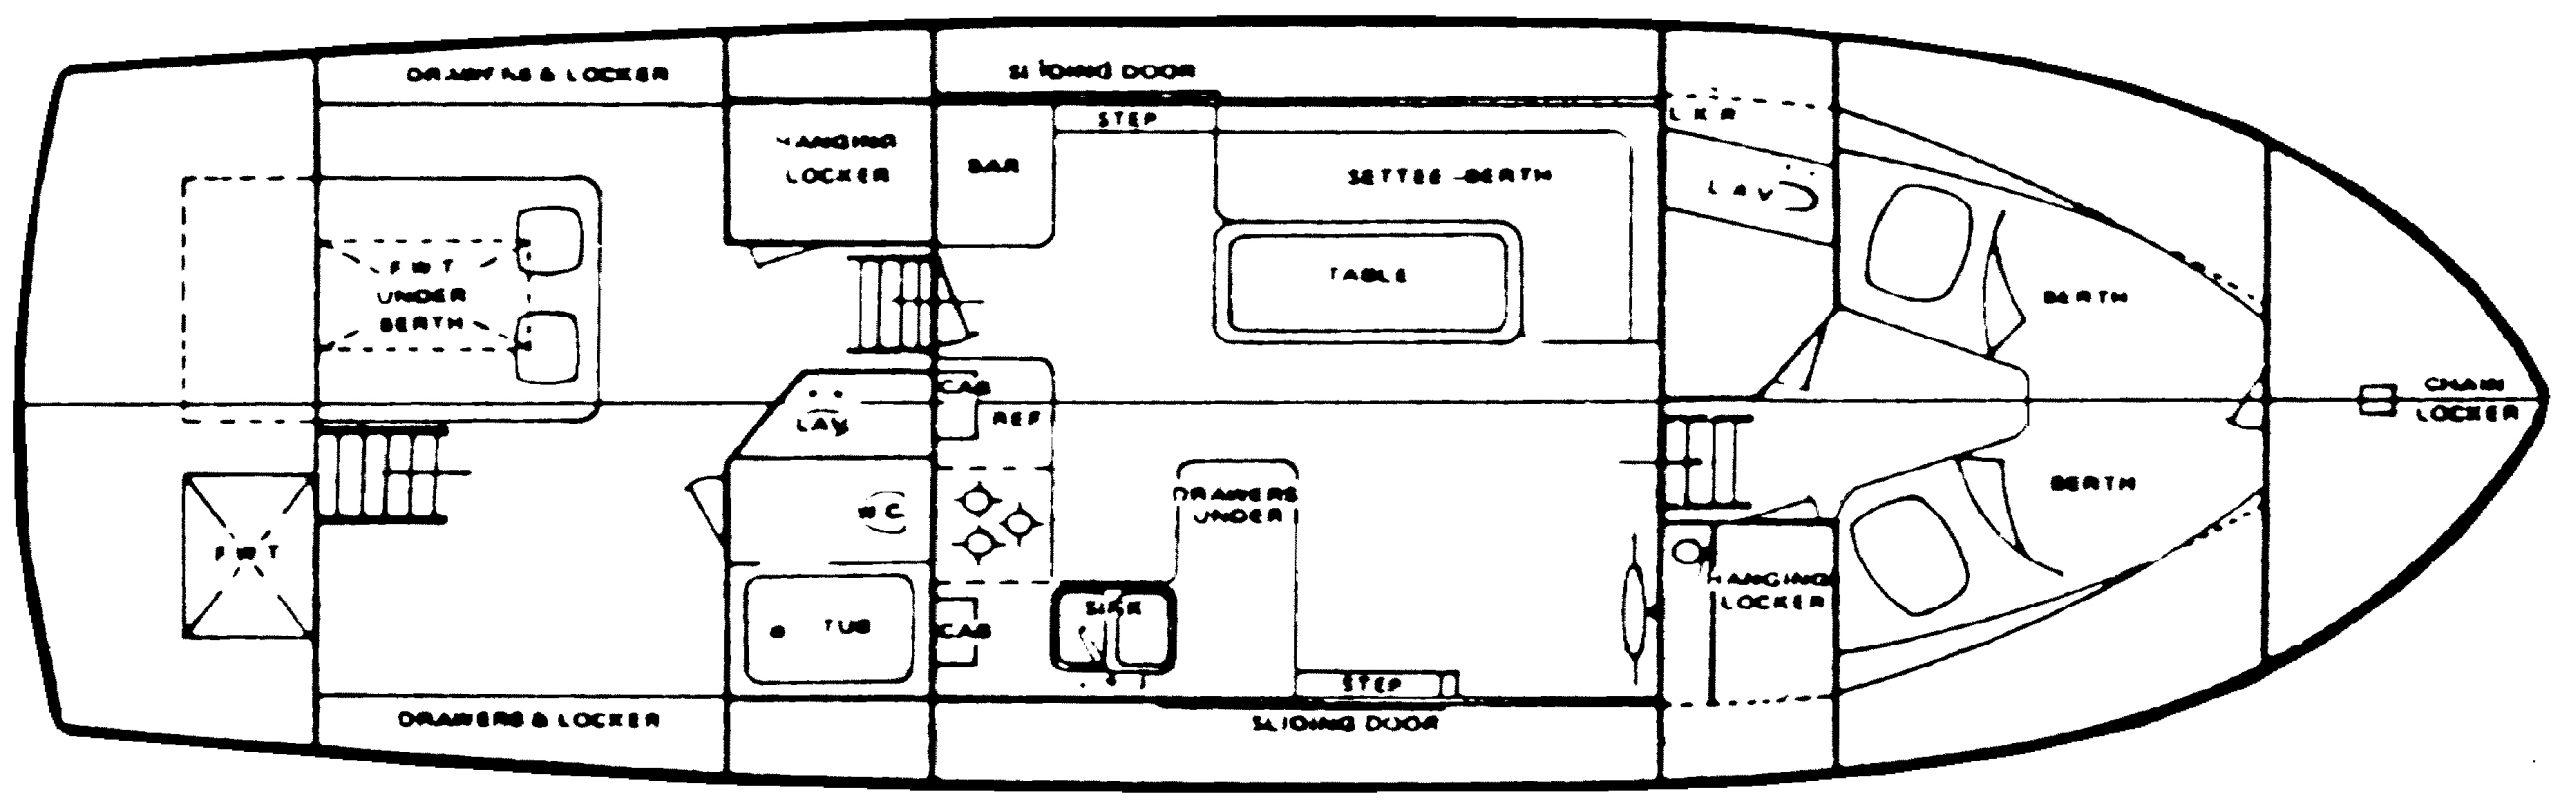 41 Trawler Floor Plan 2